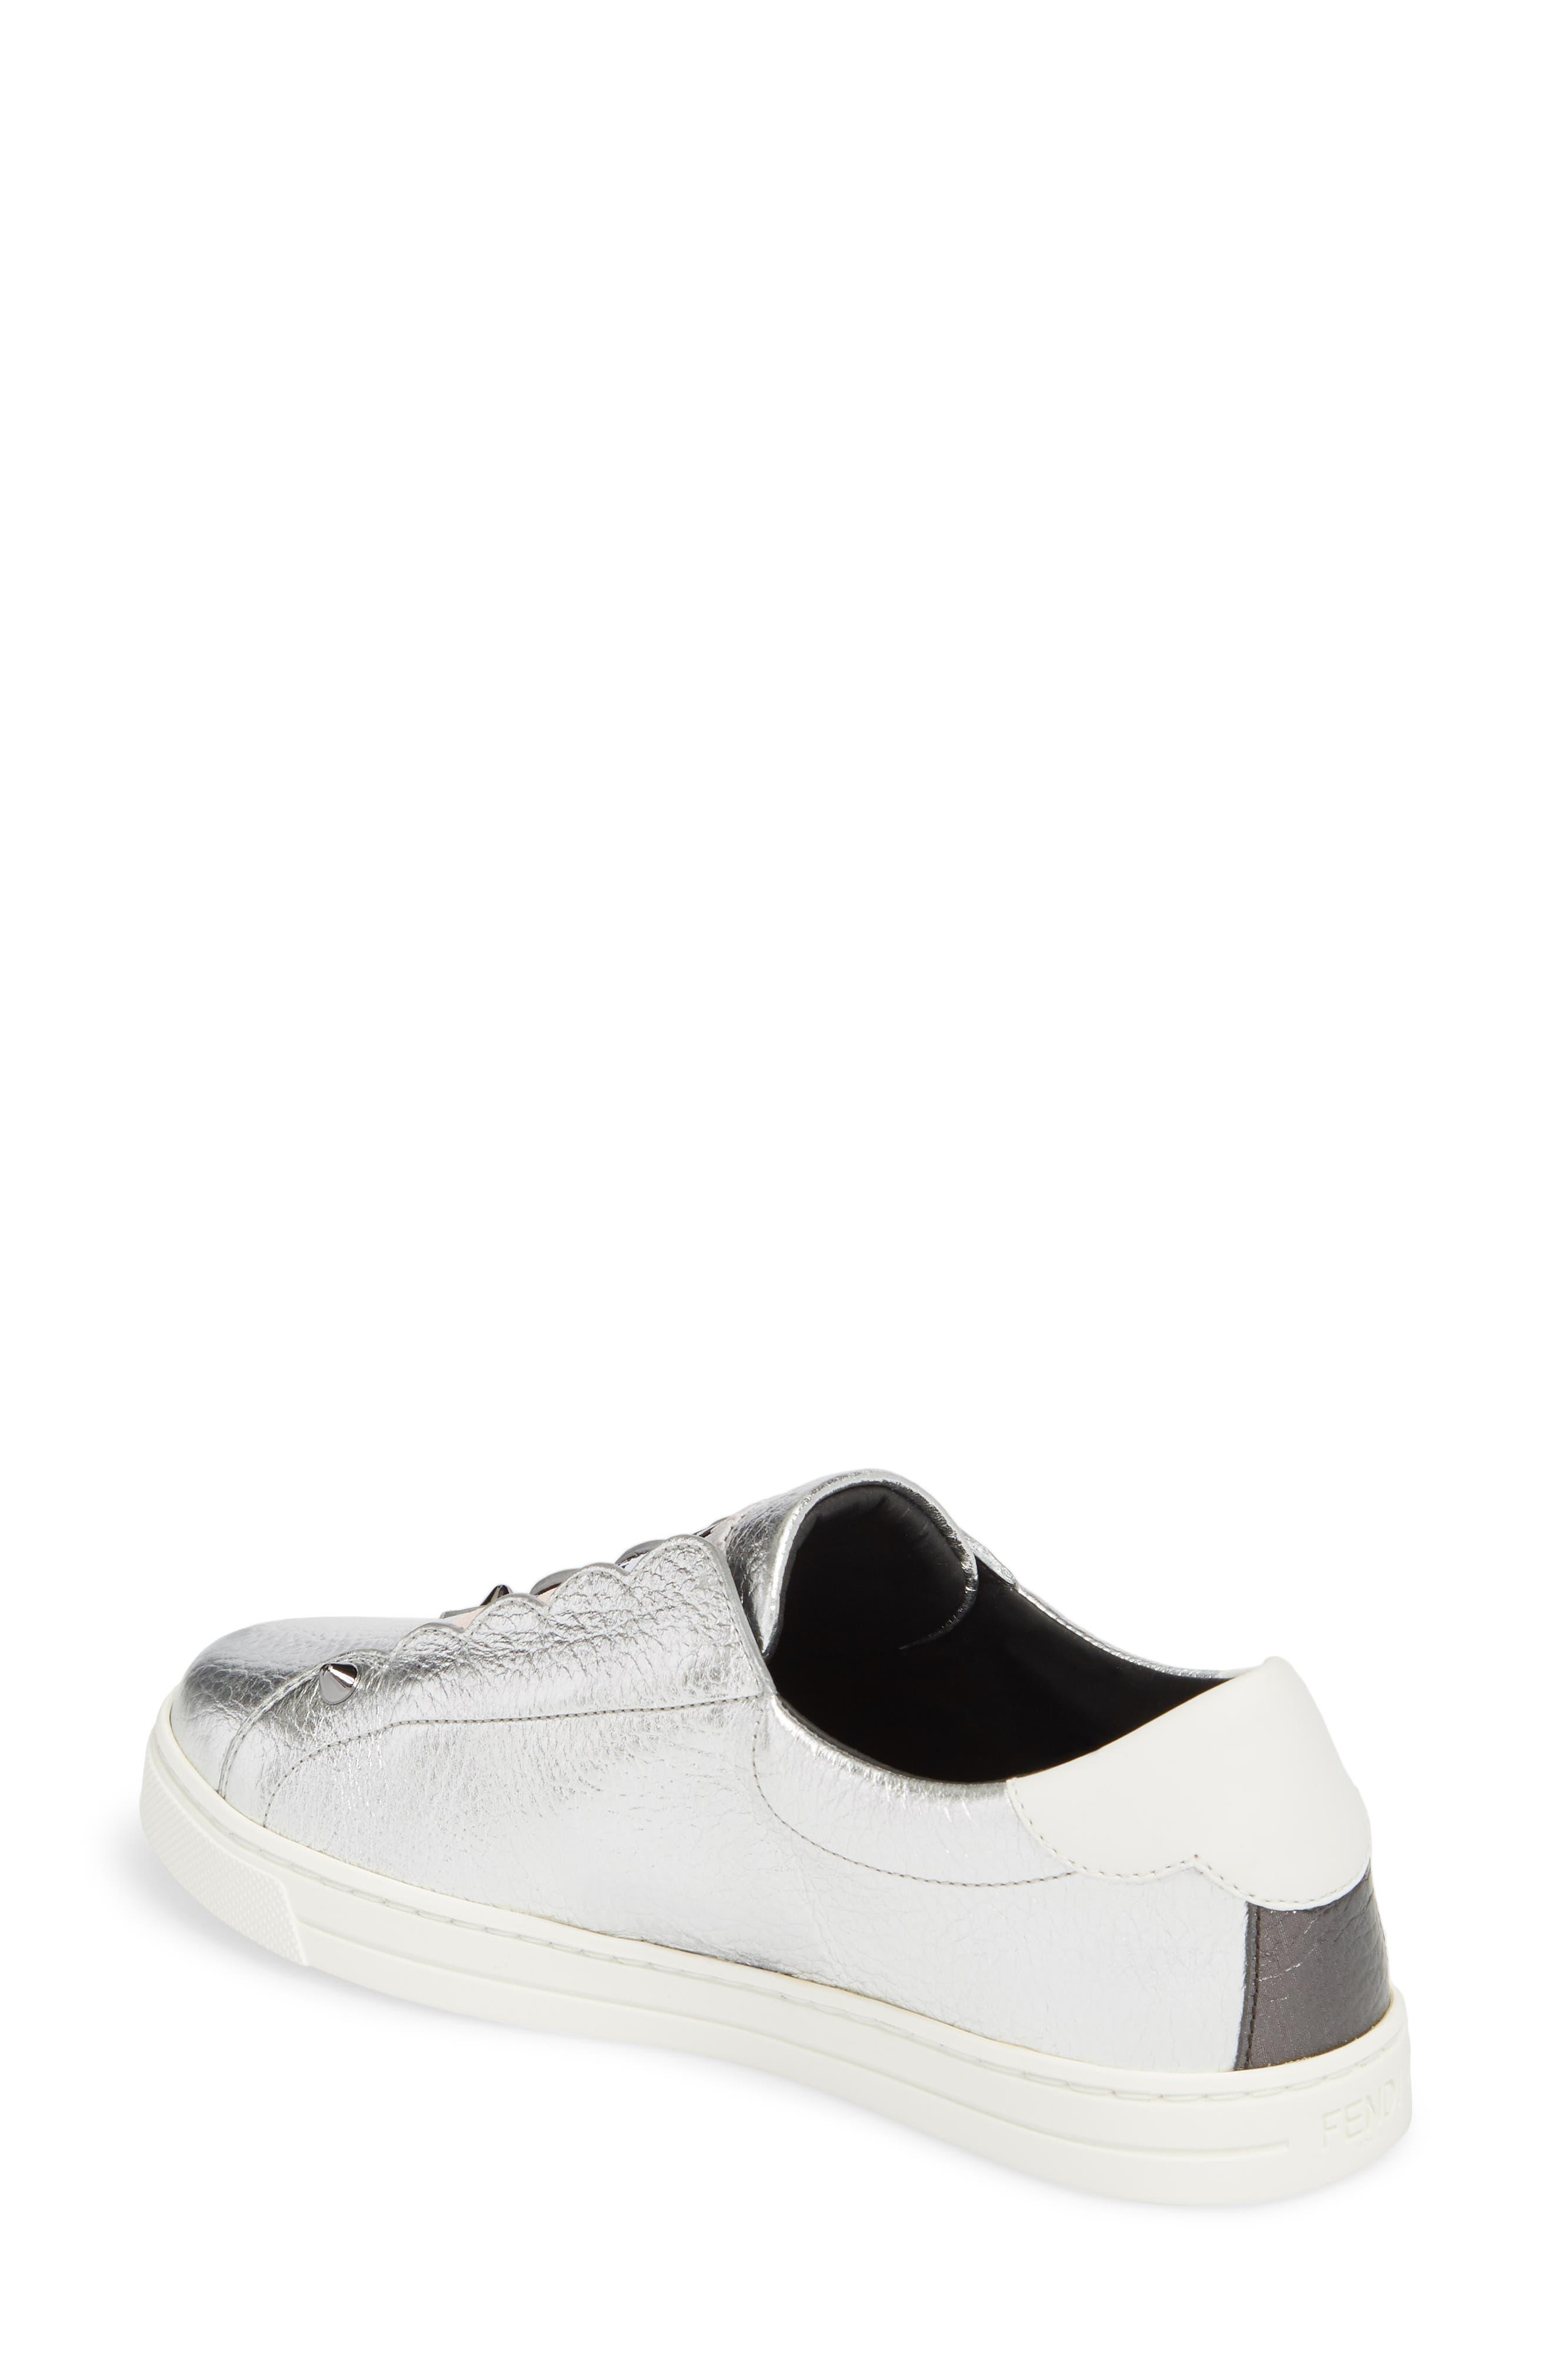 Rockono Slip-On Sneaker,                             Alternate thumbnail 2, color,                             SILVER